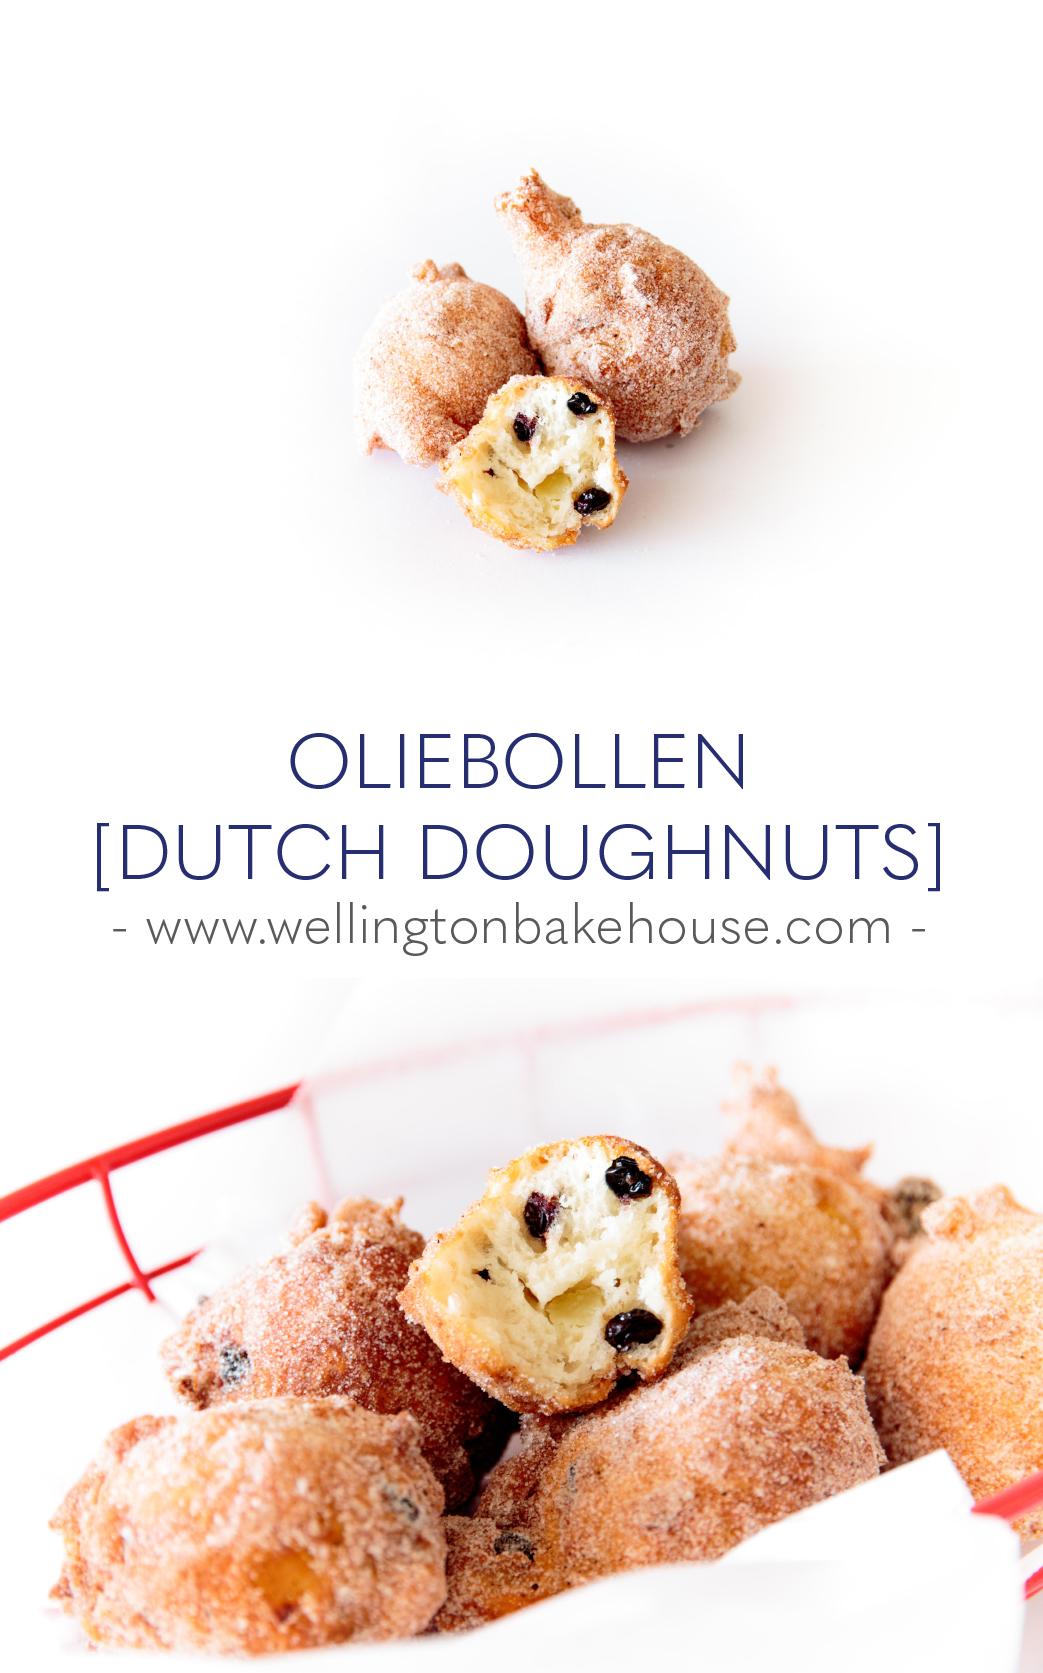 Wellington Bakehouse Oliebollen